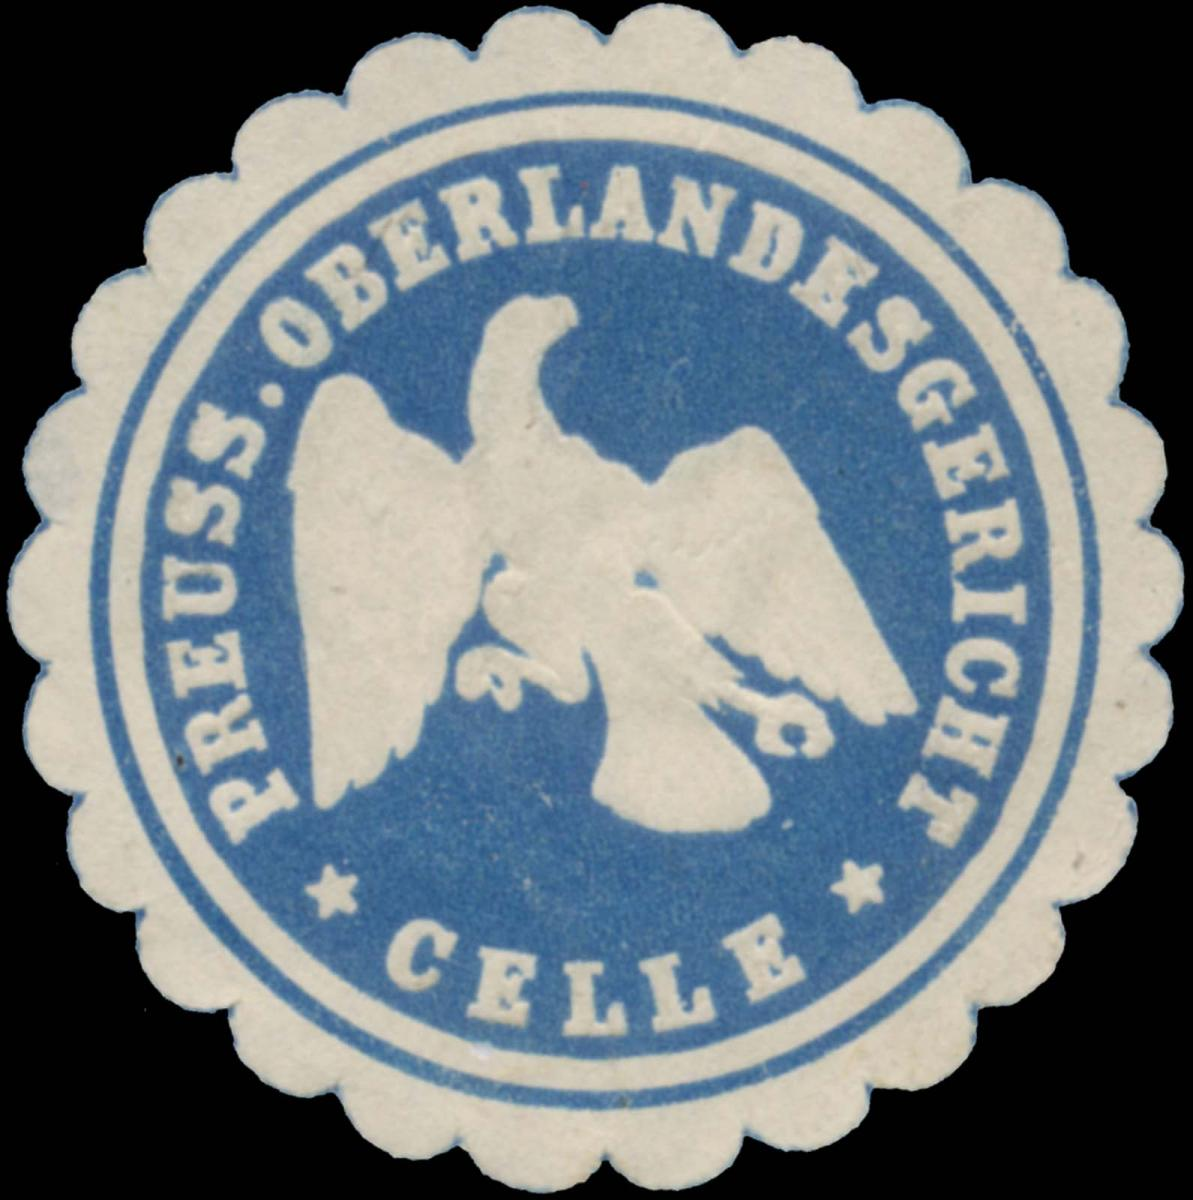 Pr. Oberlandesgericht Celle 0